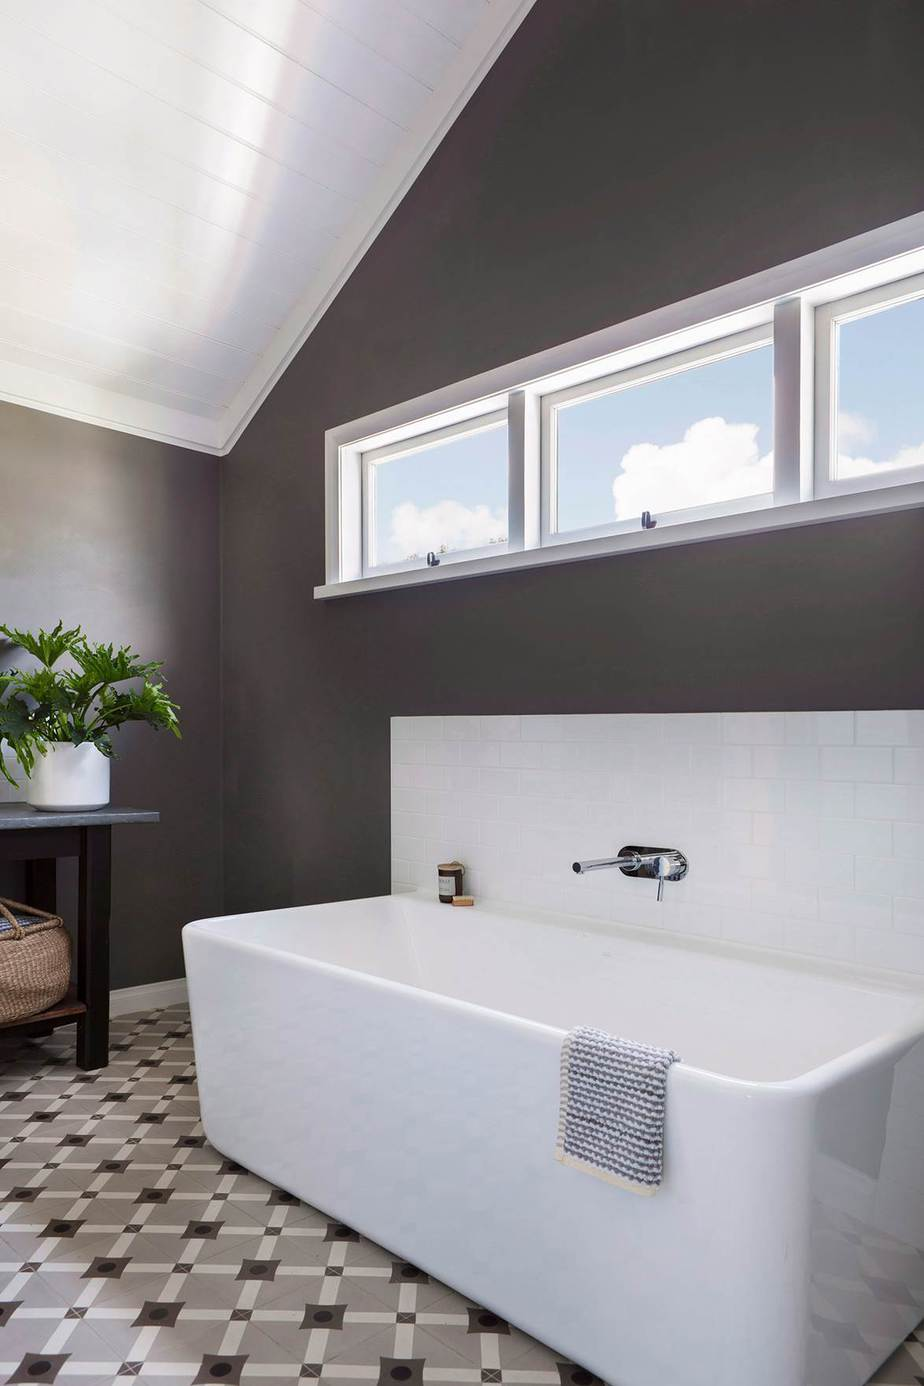 5.Natural Bathroom concept By Simphome.com